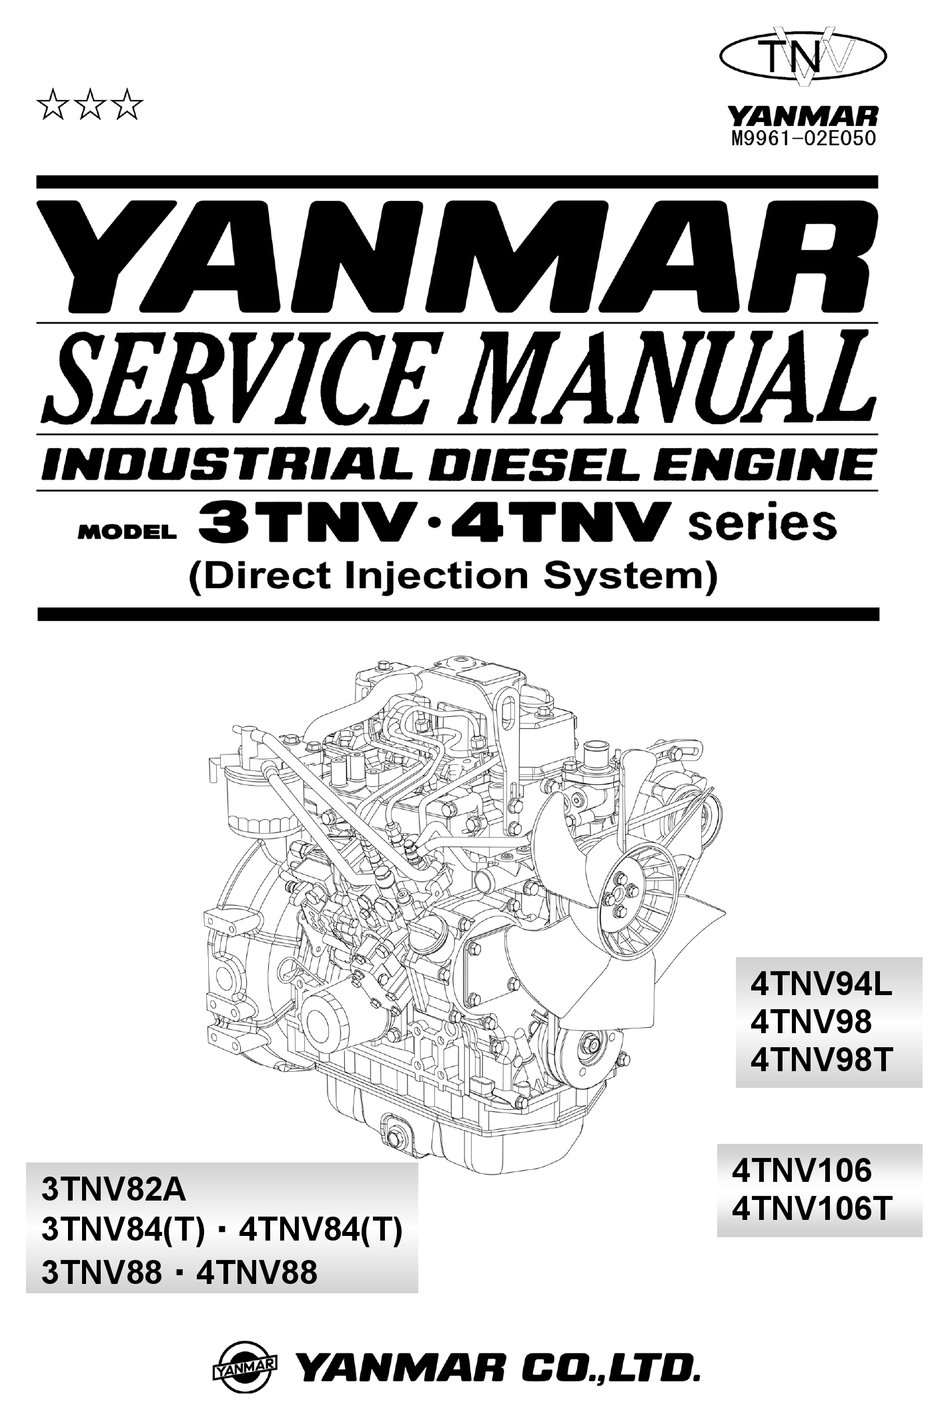 Yanmar 3tnv Series Service Manual Pdf Download Manualslib